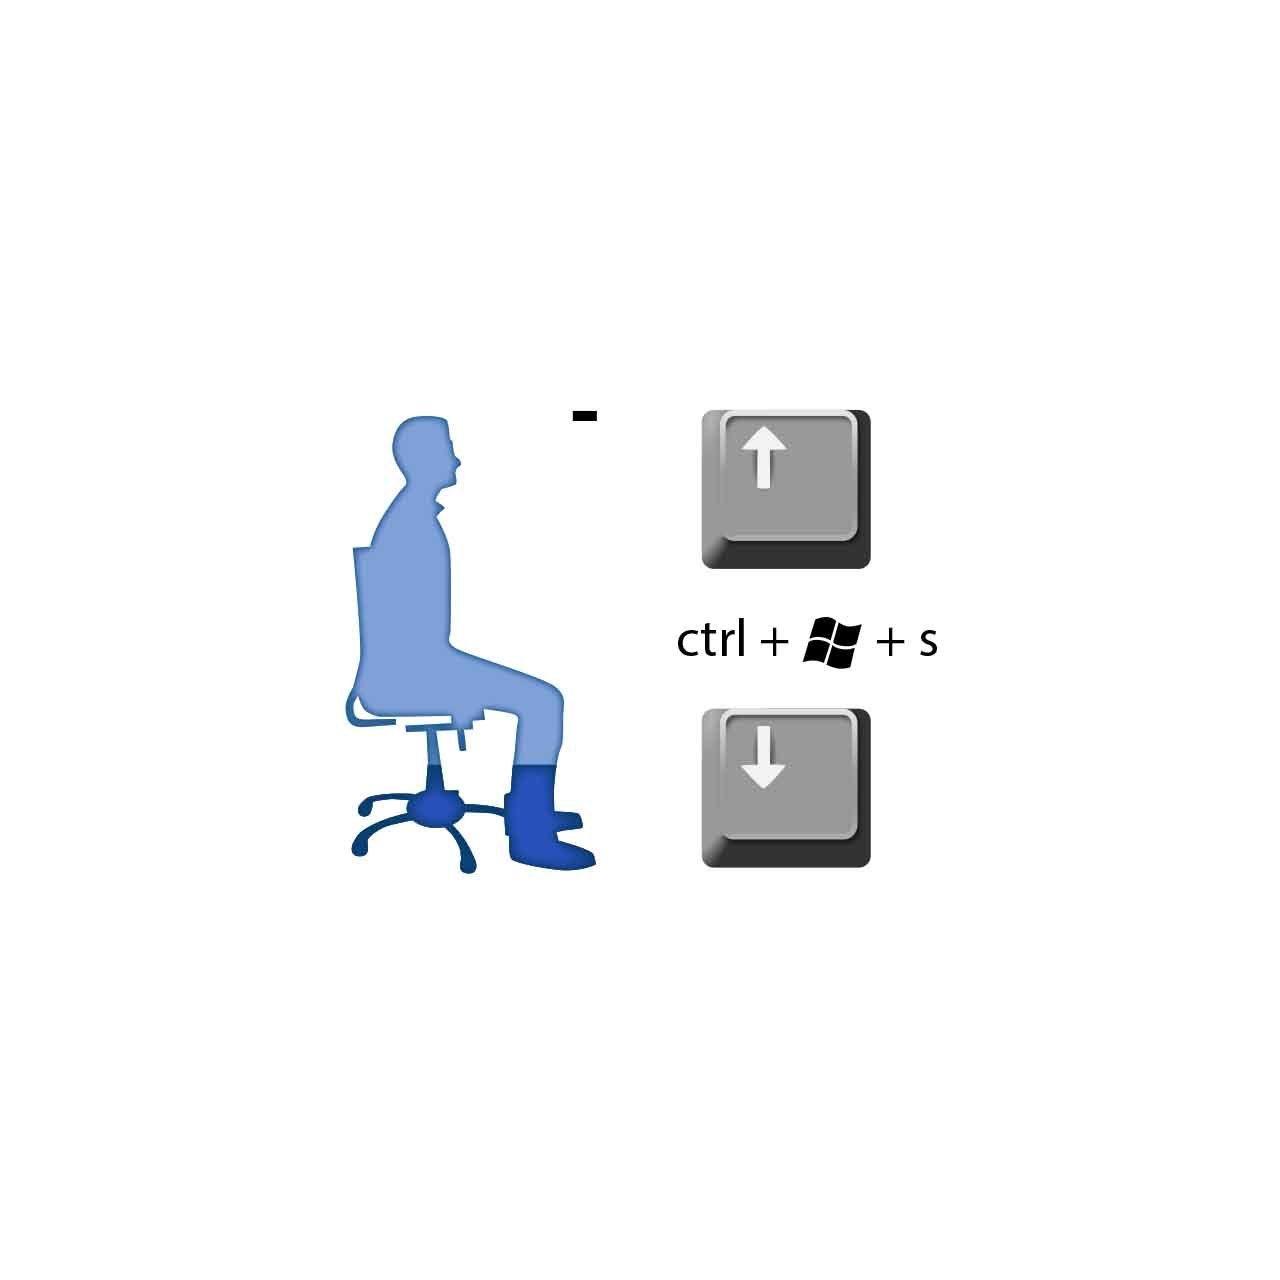 SitStandCoach arbo software ctrl + windows + s